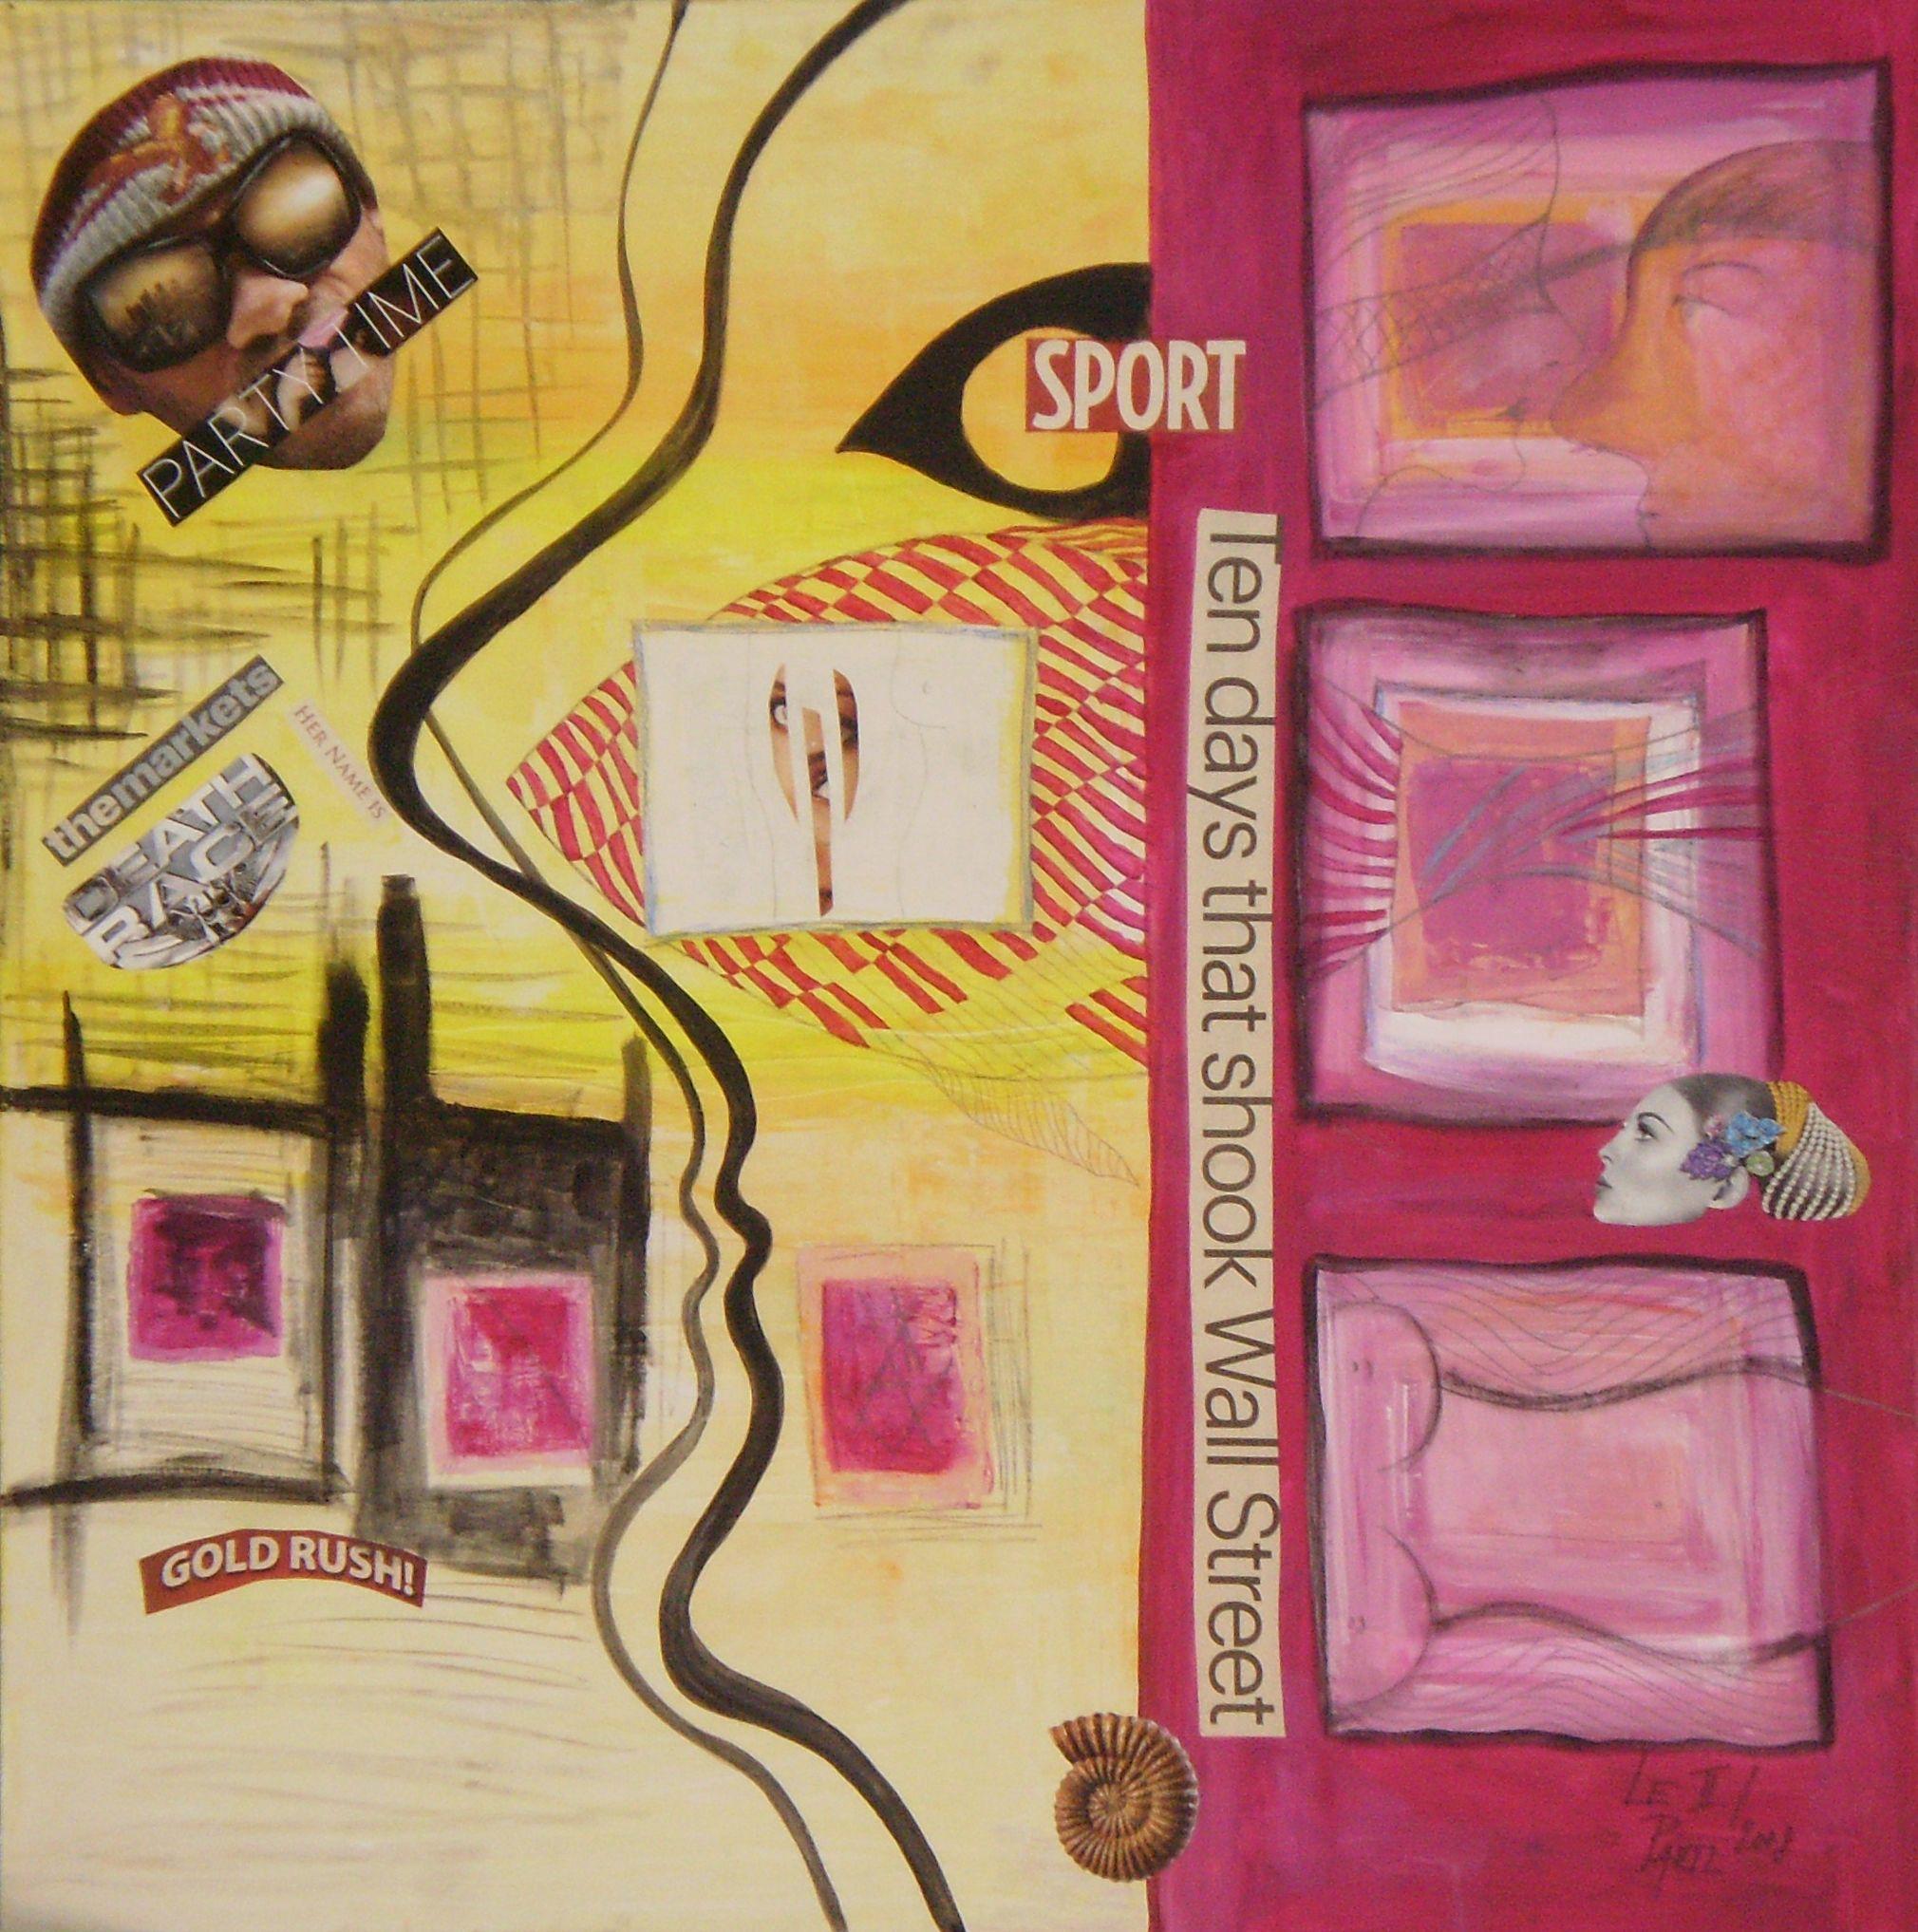 Wall Street artwork by Lenka Le Partl - art listed for sale on Artplode